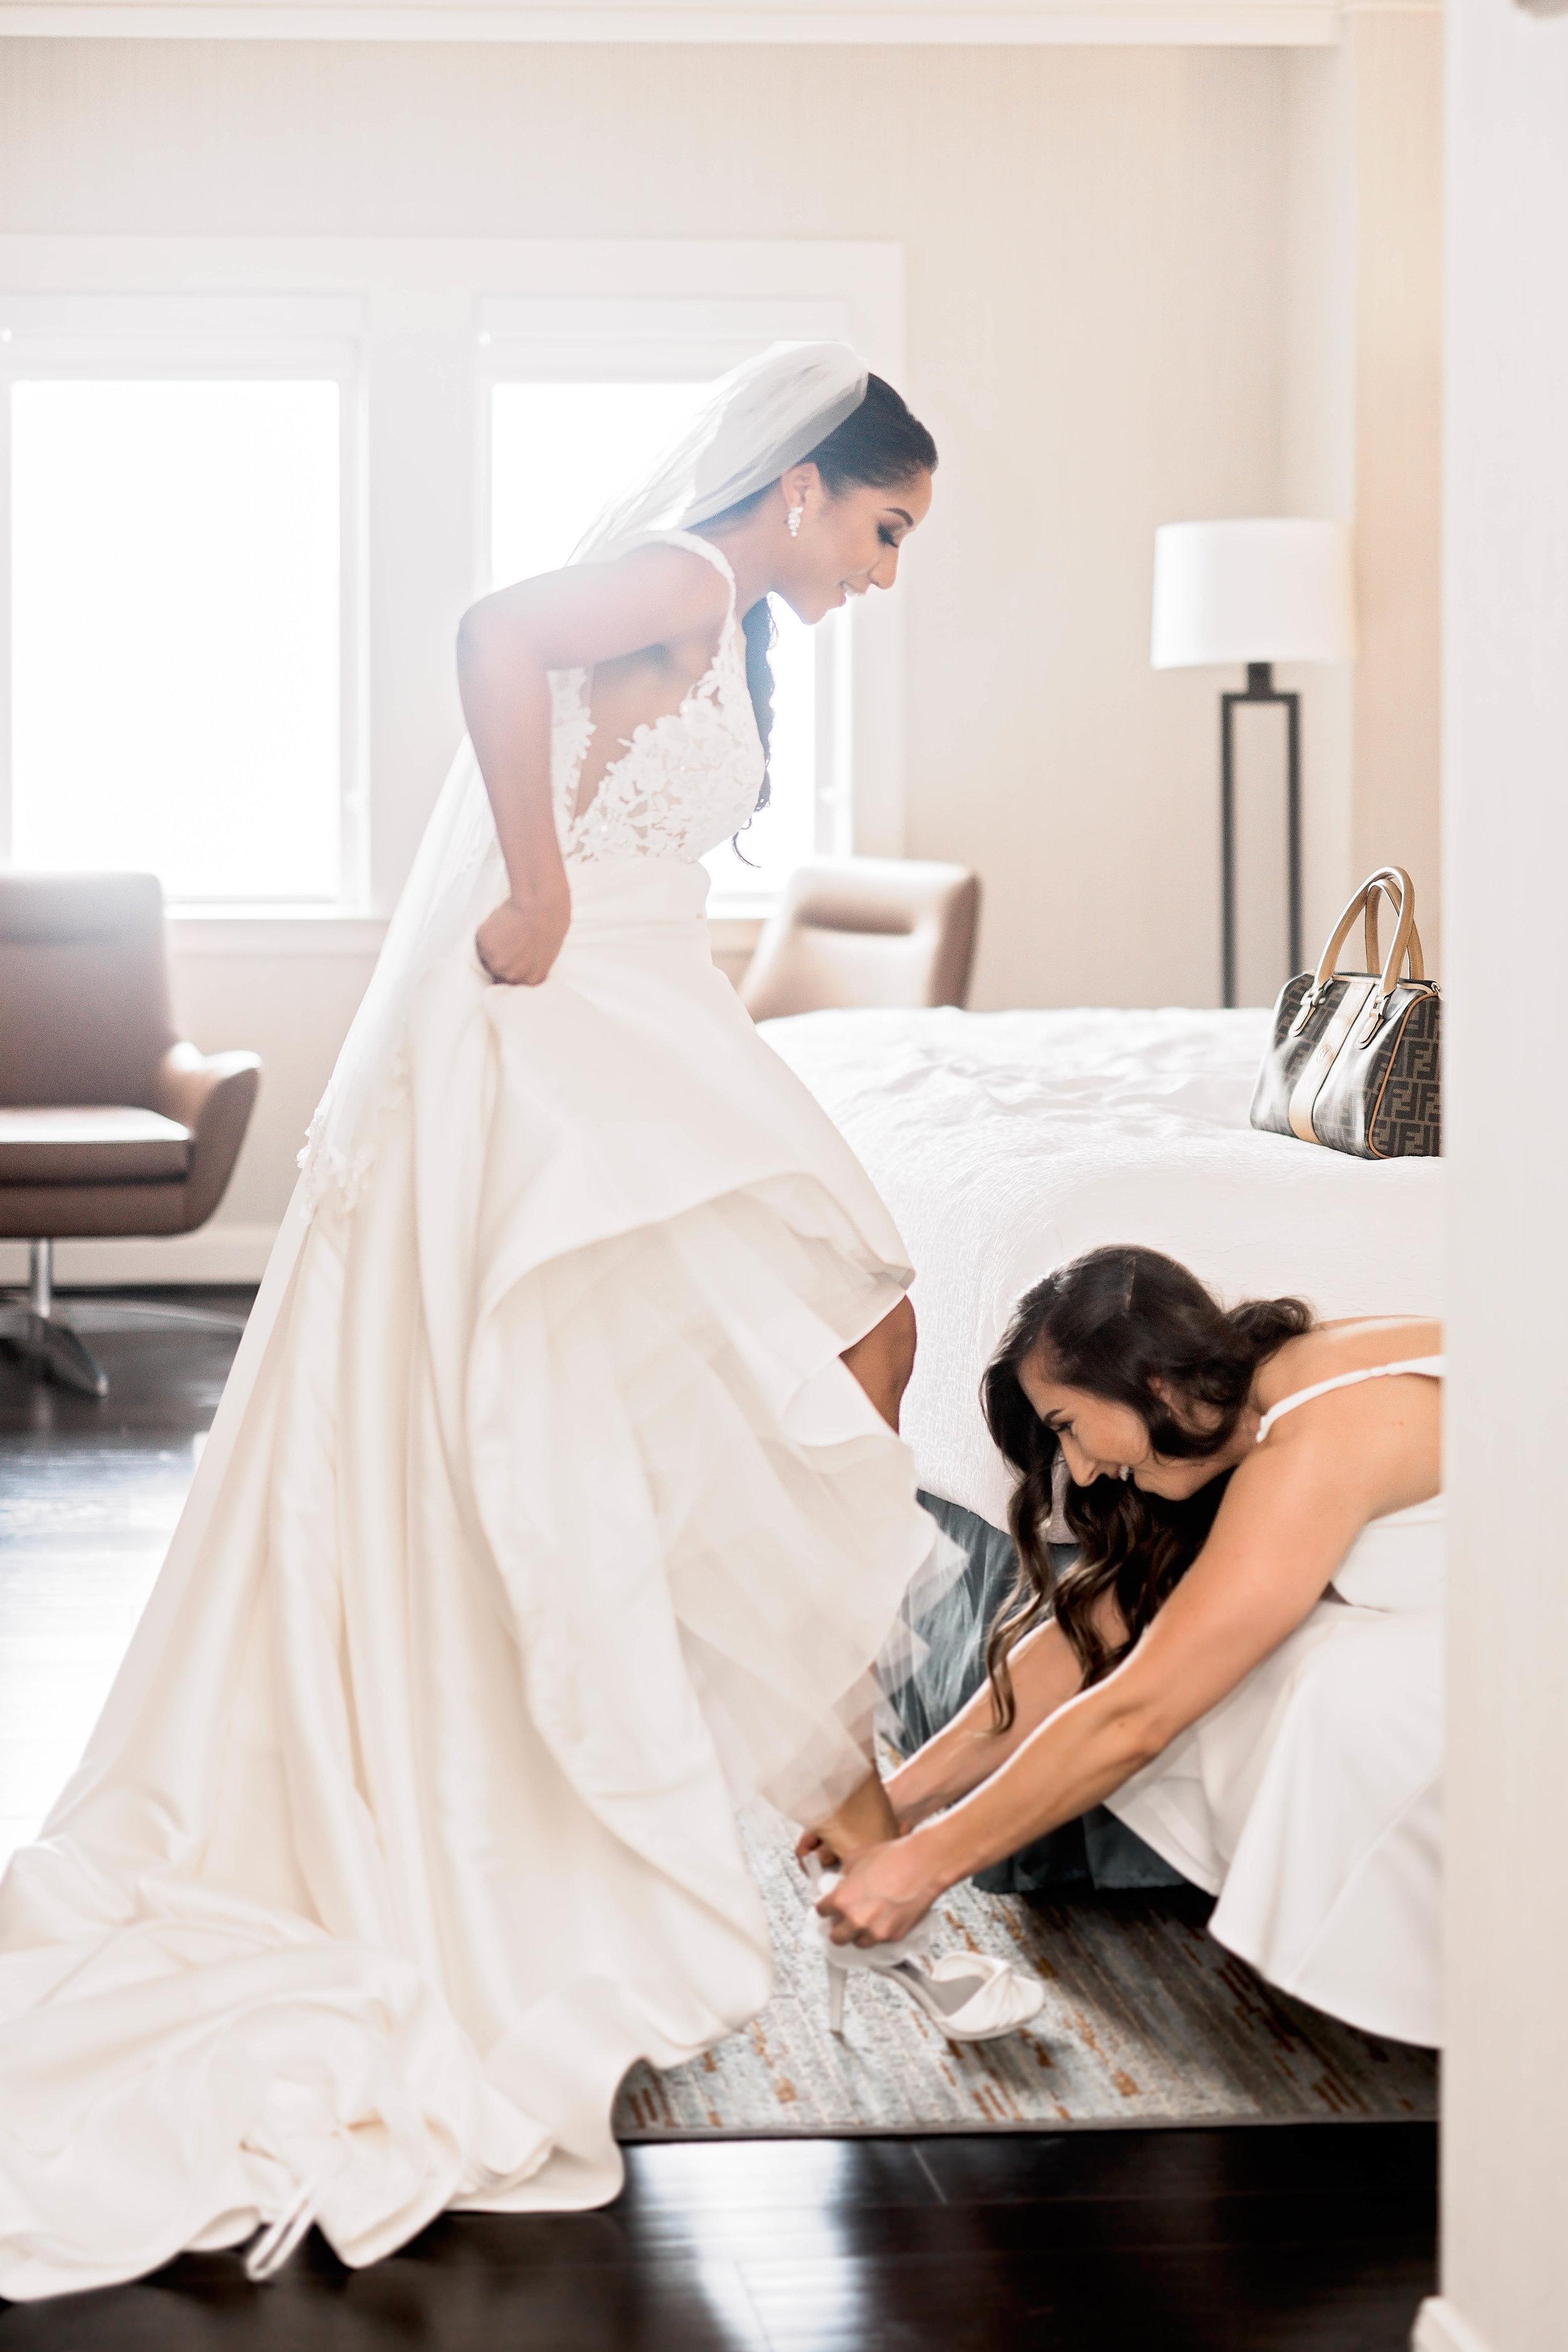 Houston Wedding- Pharris Photography- Getting Ready- Natalie + Mark- Bride- Shoes